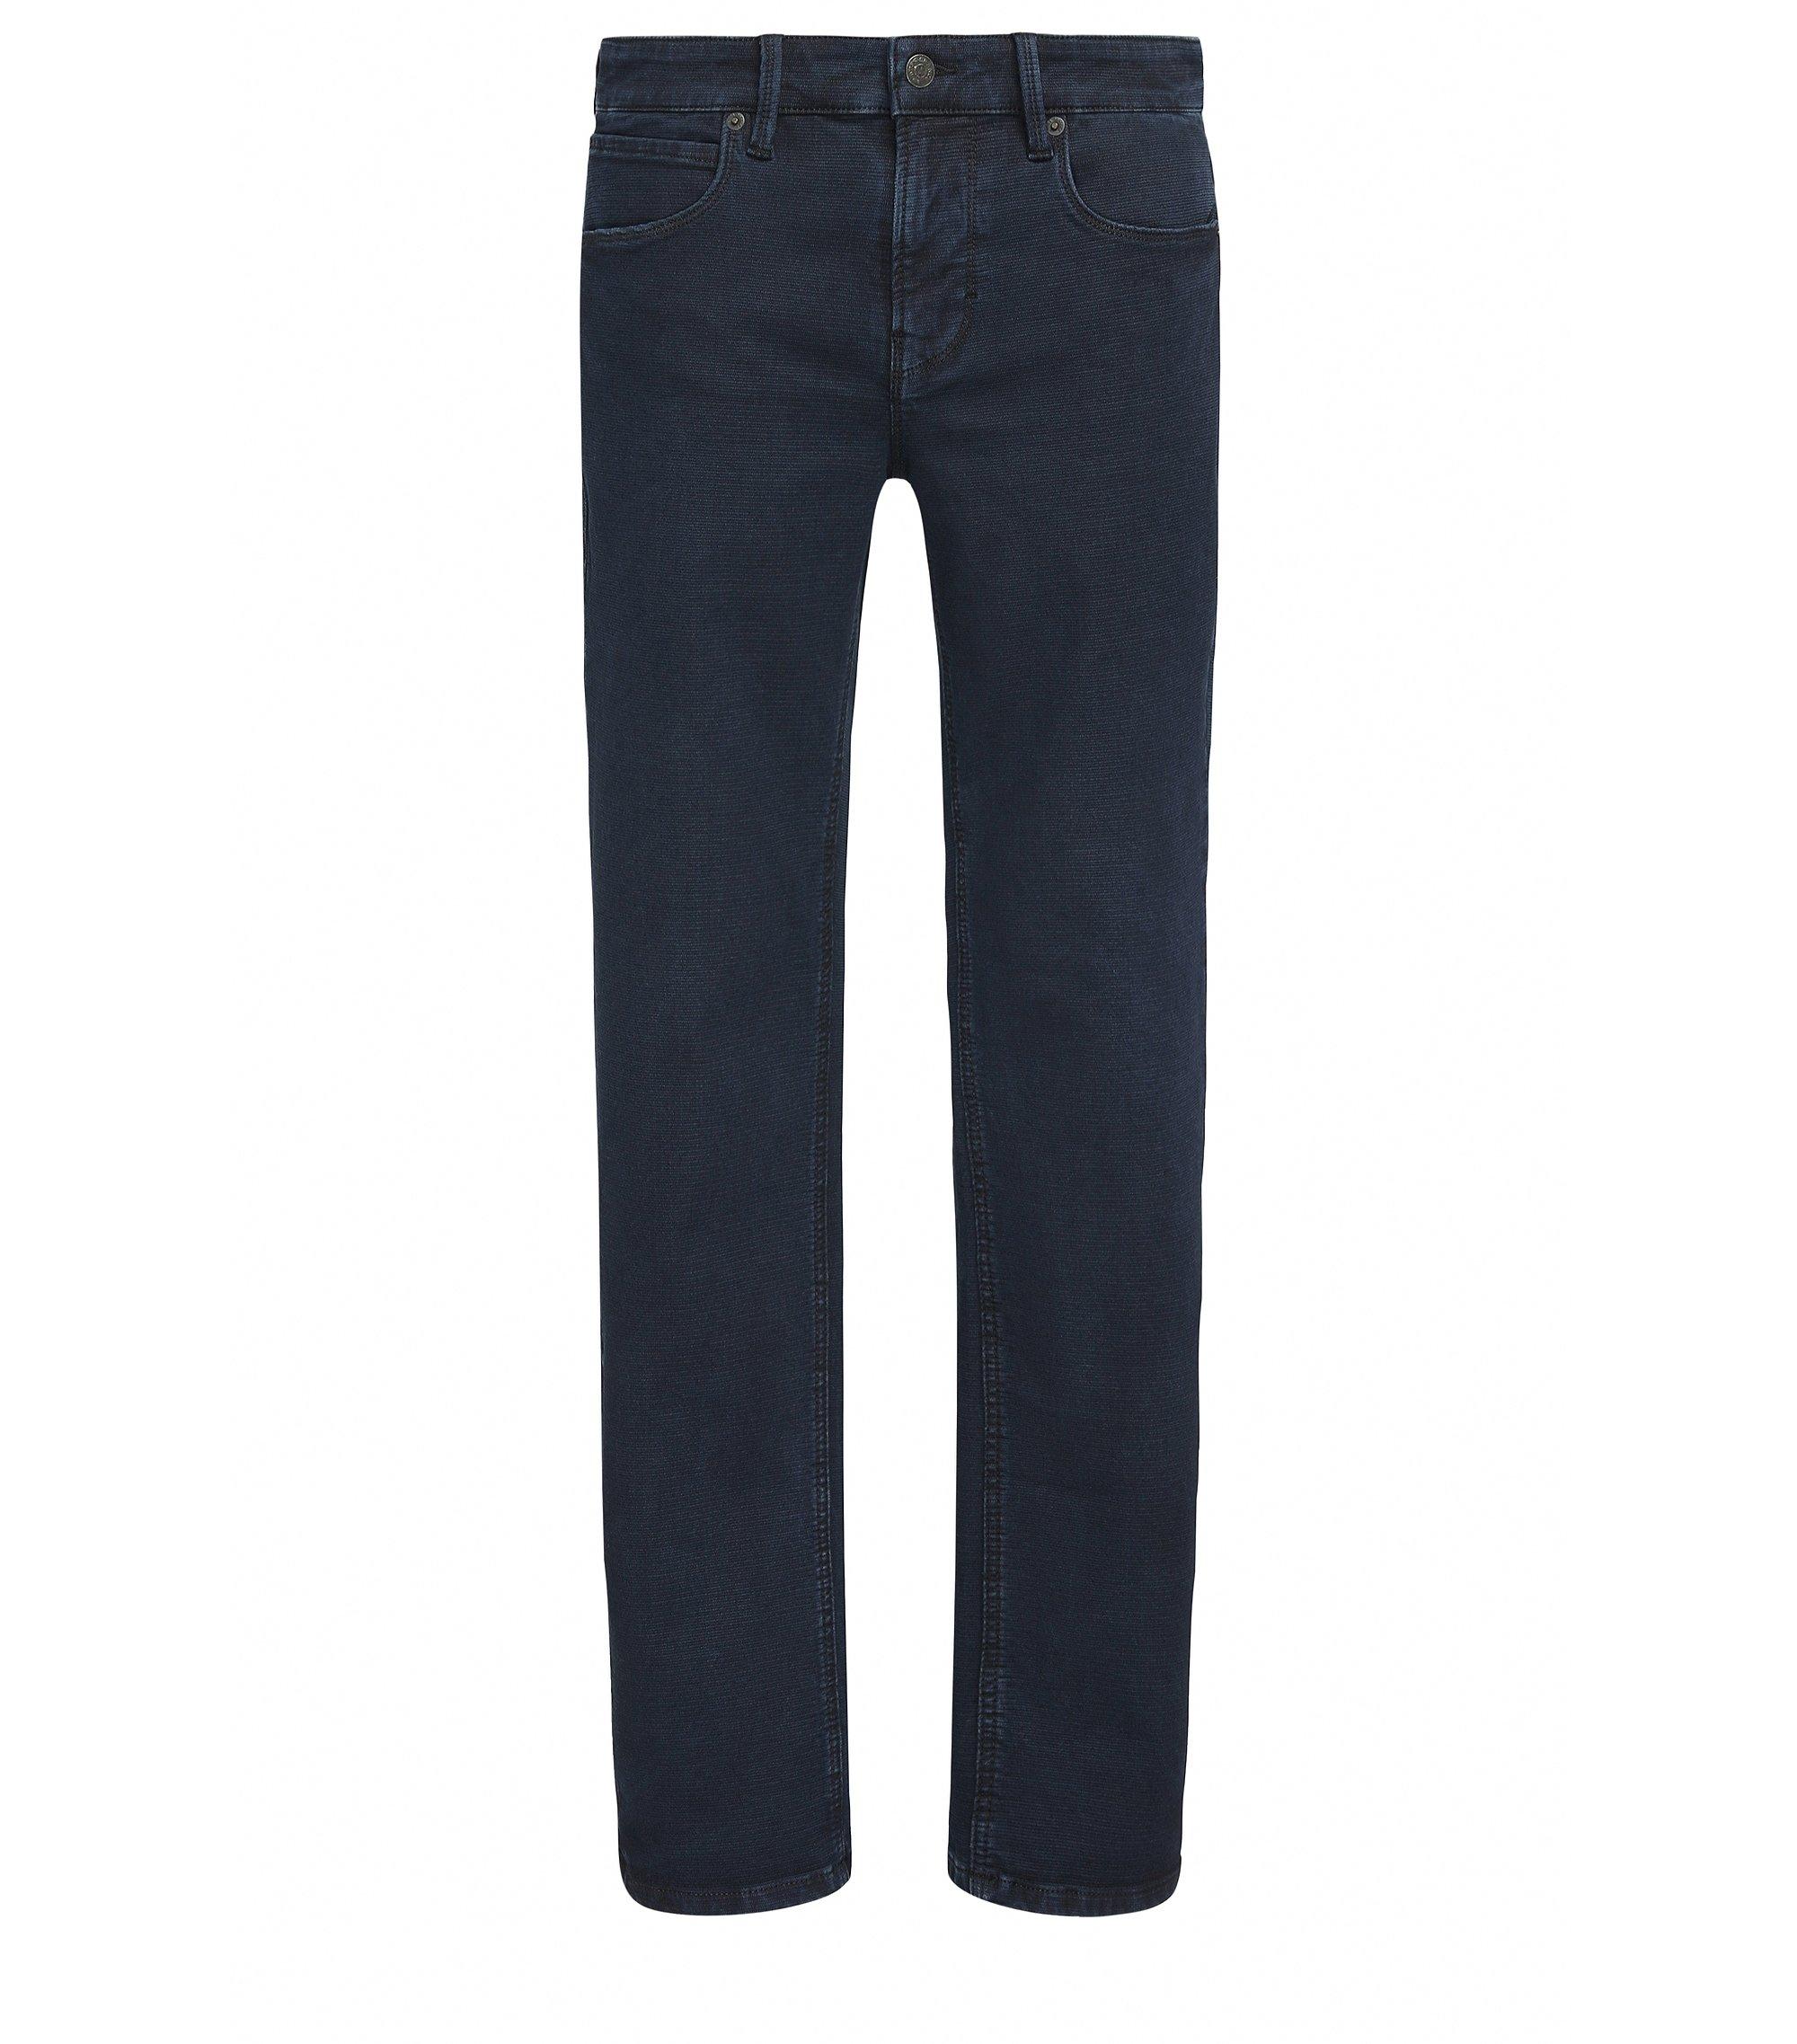 Jeans Slim Fit en denim dobby stretch , Bleu foncé